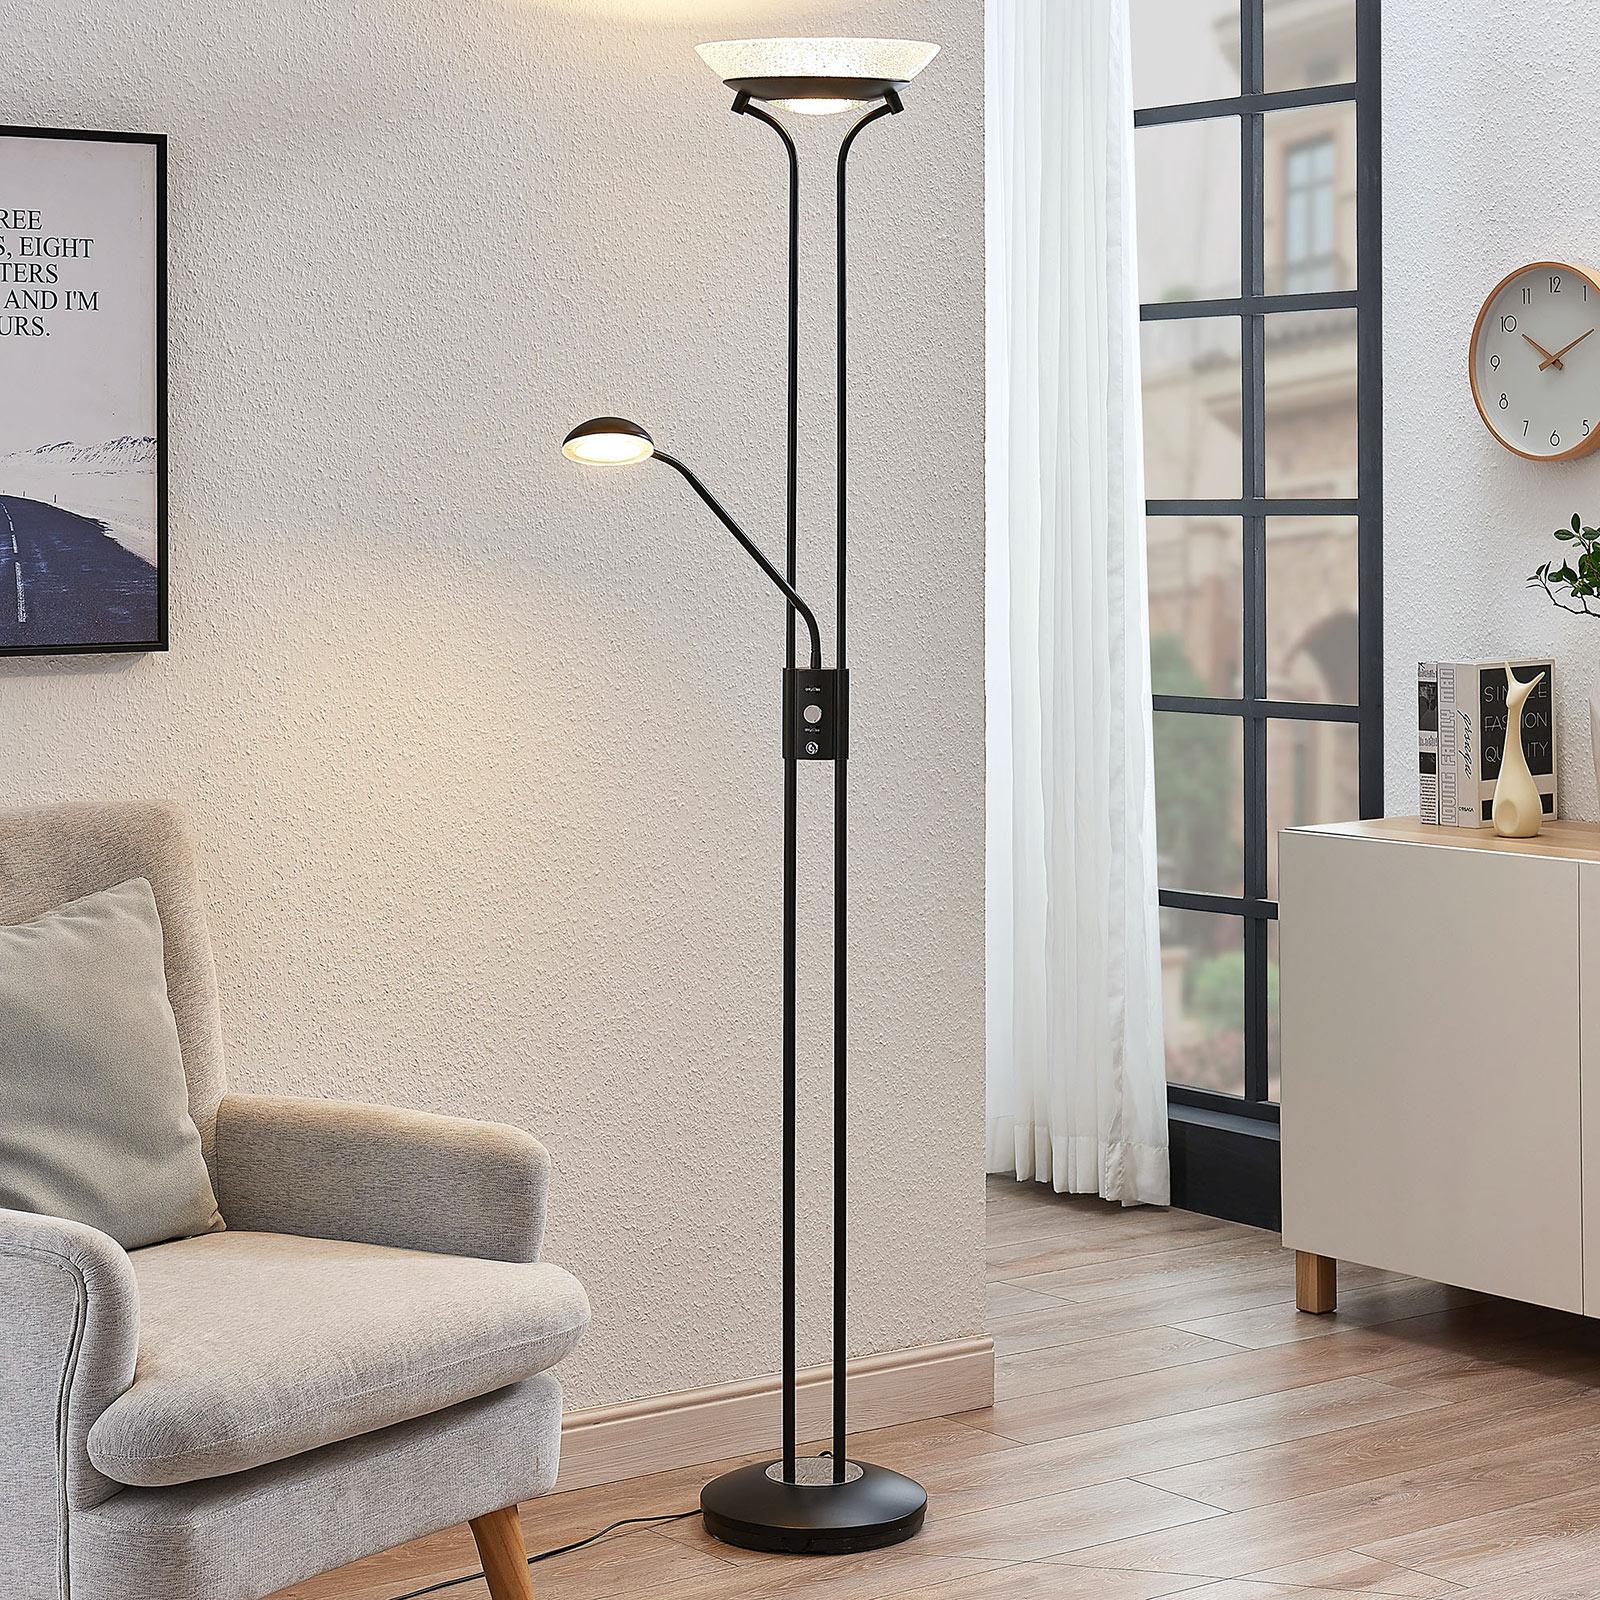 Lampa LED oświetl. sufit Dimitra z lampką, czarna